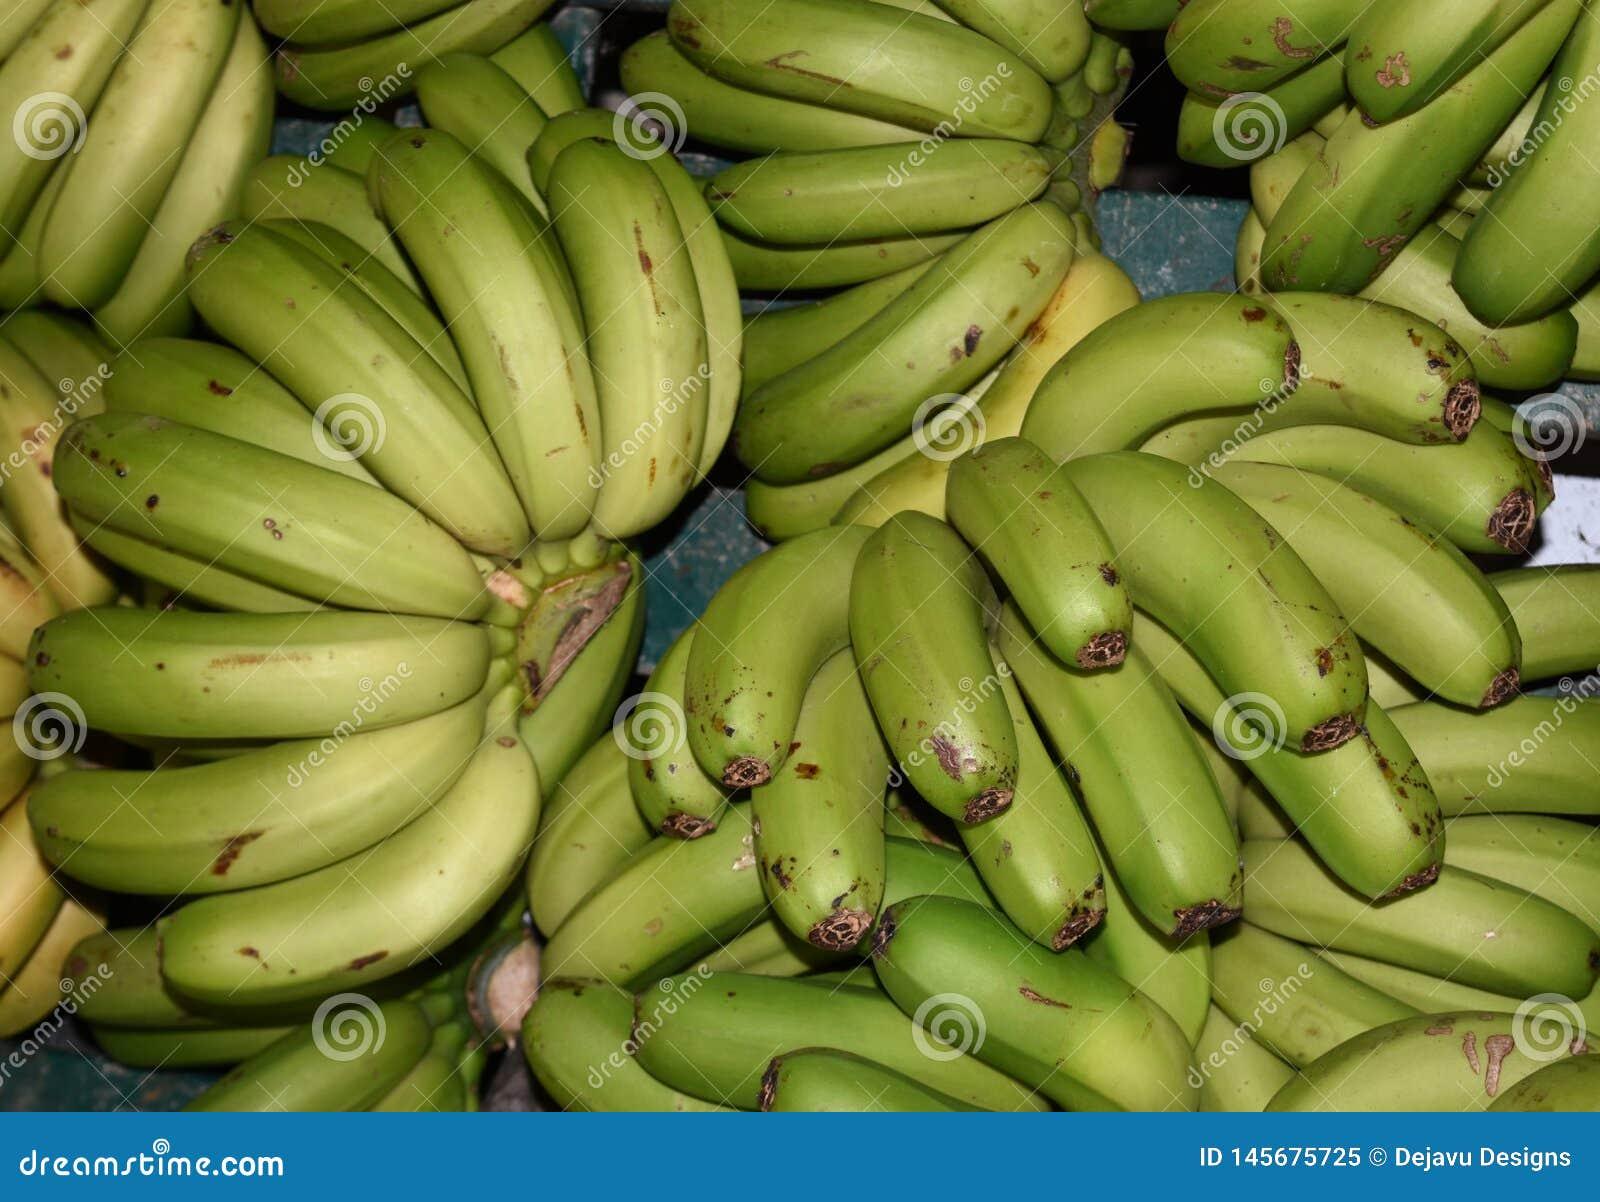 Grupos das bananas verdes crescidas recentemente disponíveis no mercado